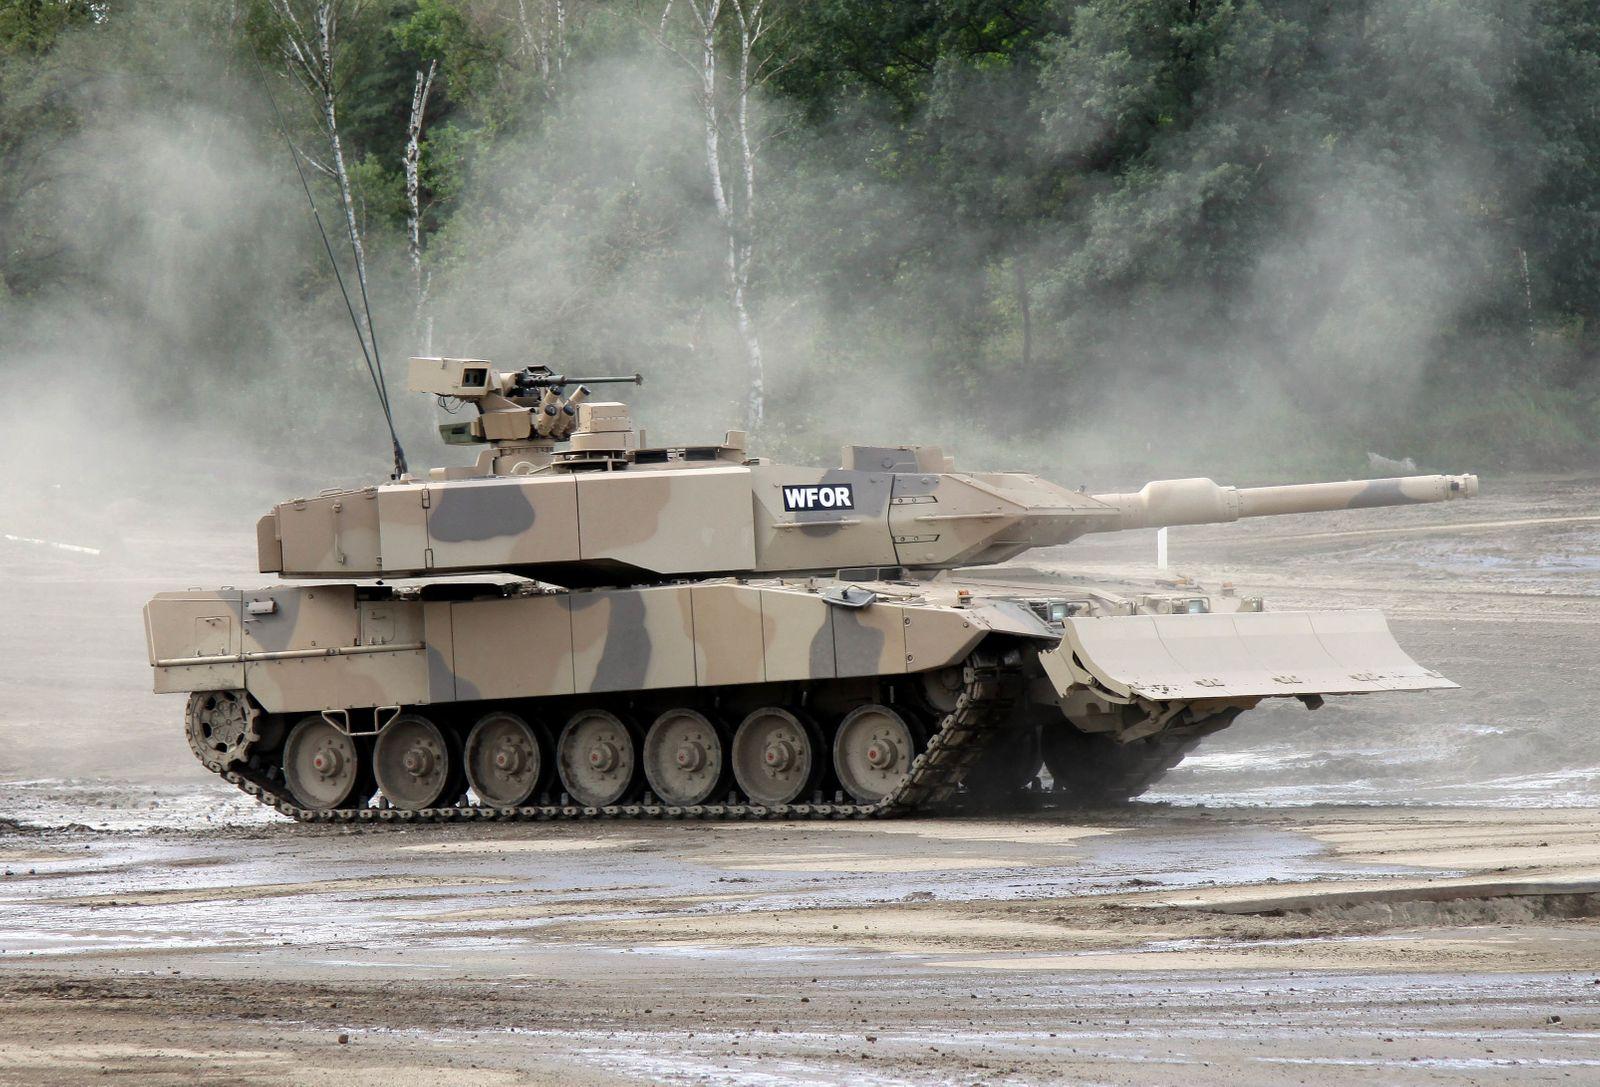 Rüstungsexporte - Kampfpanzer Leopard